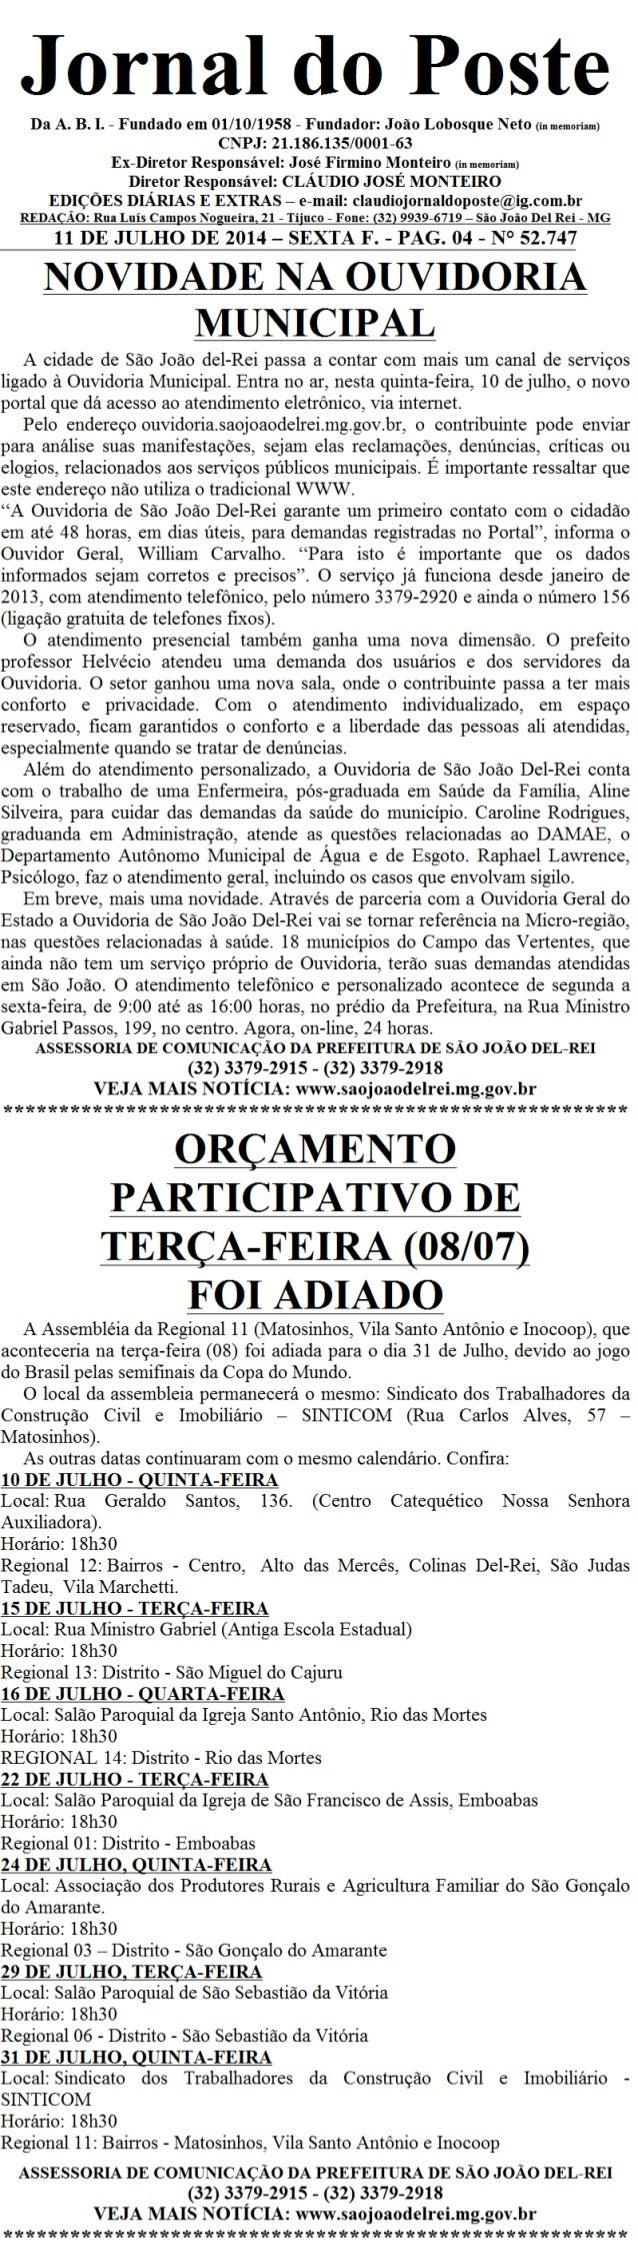 Jornal do poste 33 b 3